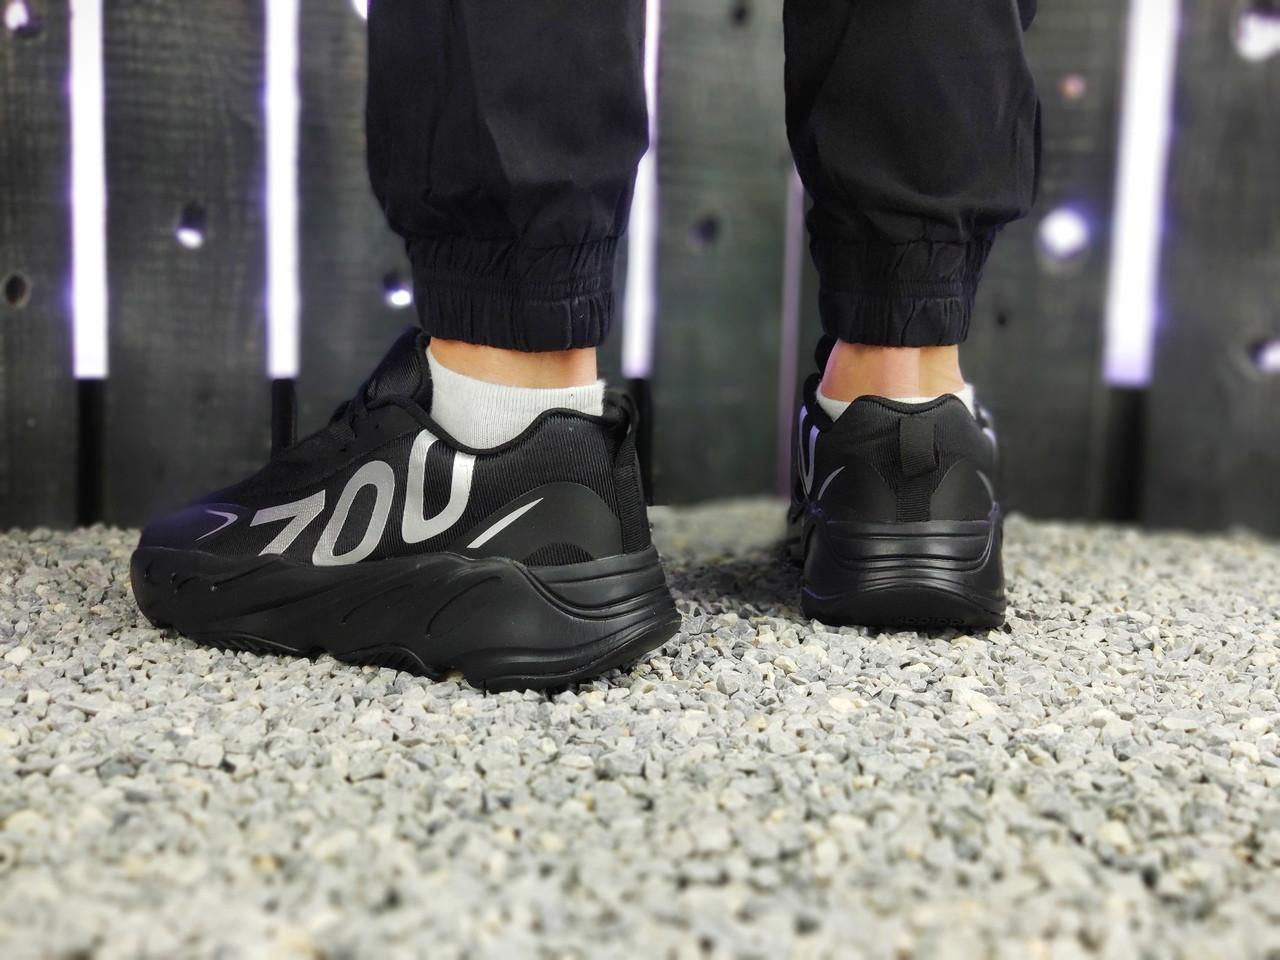 7c4194c4b38b81 Мужские кроссовки Adidas (Реплика) 1041, цена 1 440 грн., купить Київ —  Prom.ua (ID#915659055)